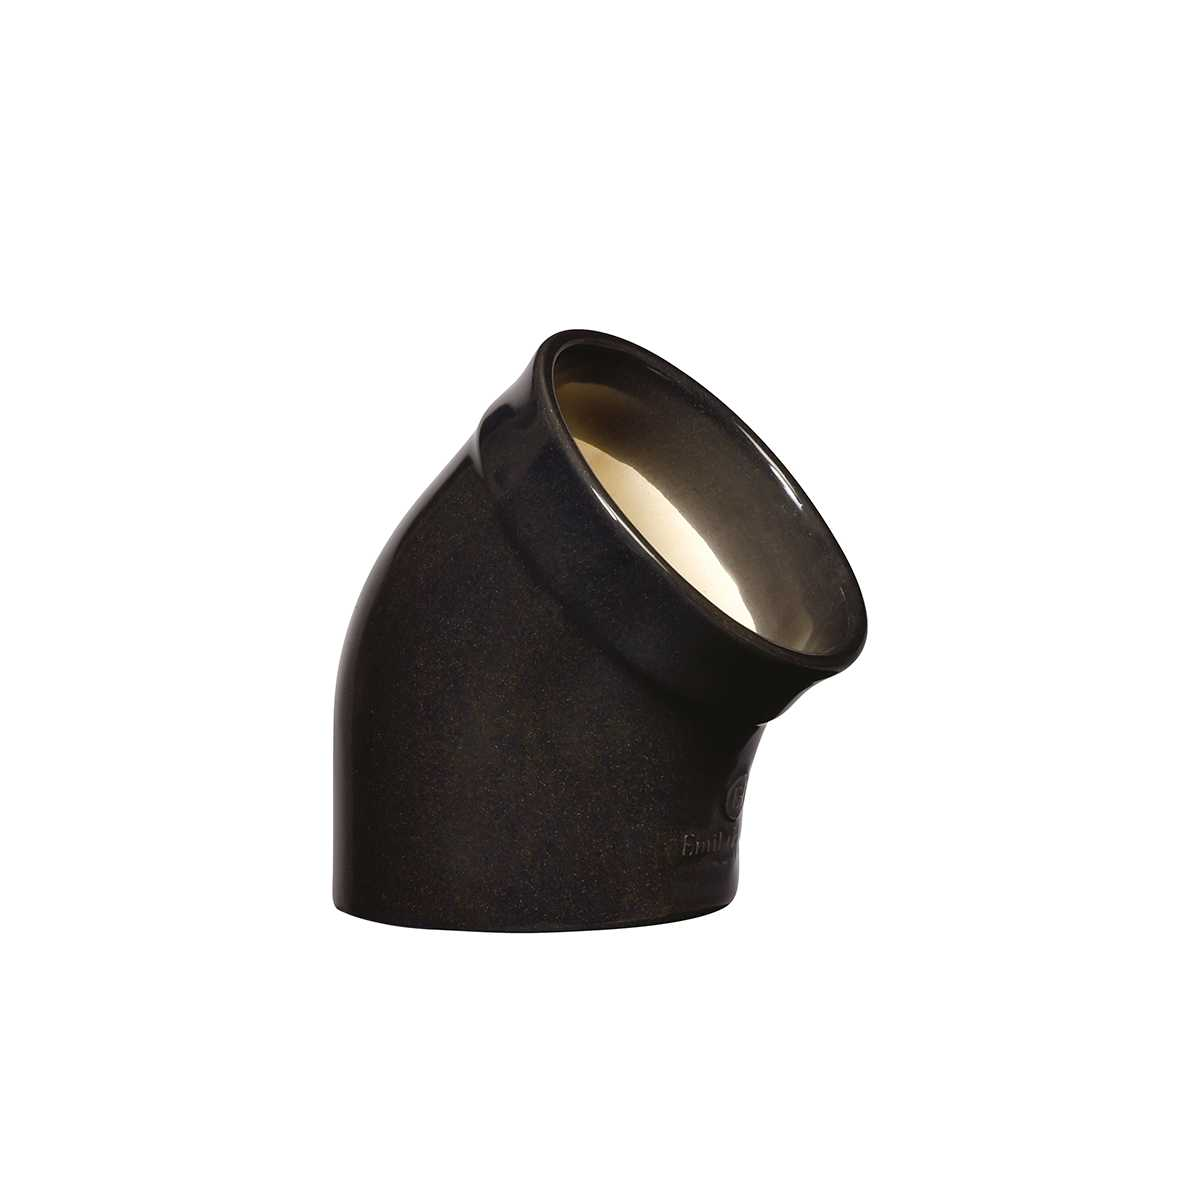 Онлайн каталог PROMENU: Рукав для соли Emile Henry Kitchen Tools, 0,35 л, серый Emile Henry 790201